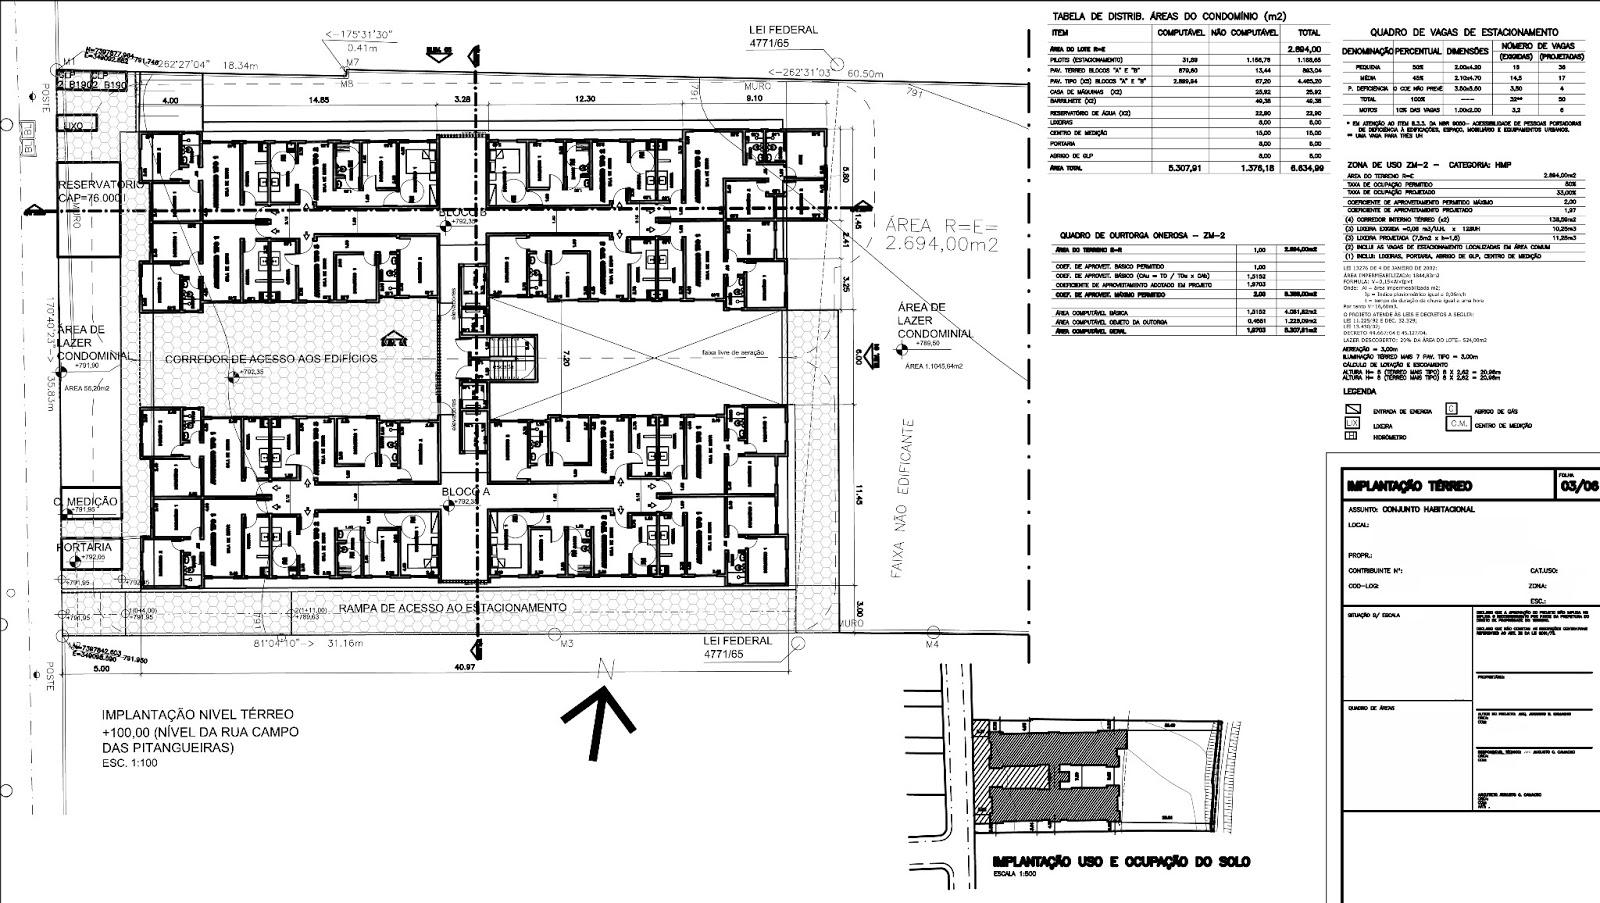 MARIANA PROJETISTA: Arquitetura #01: Ergonomia > Acessibilidade #383838 1600 903